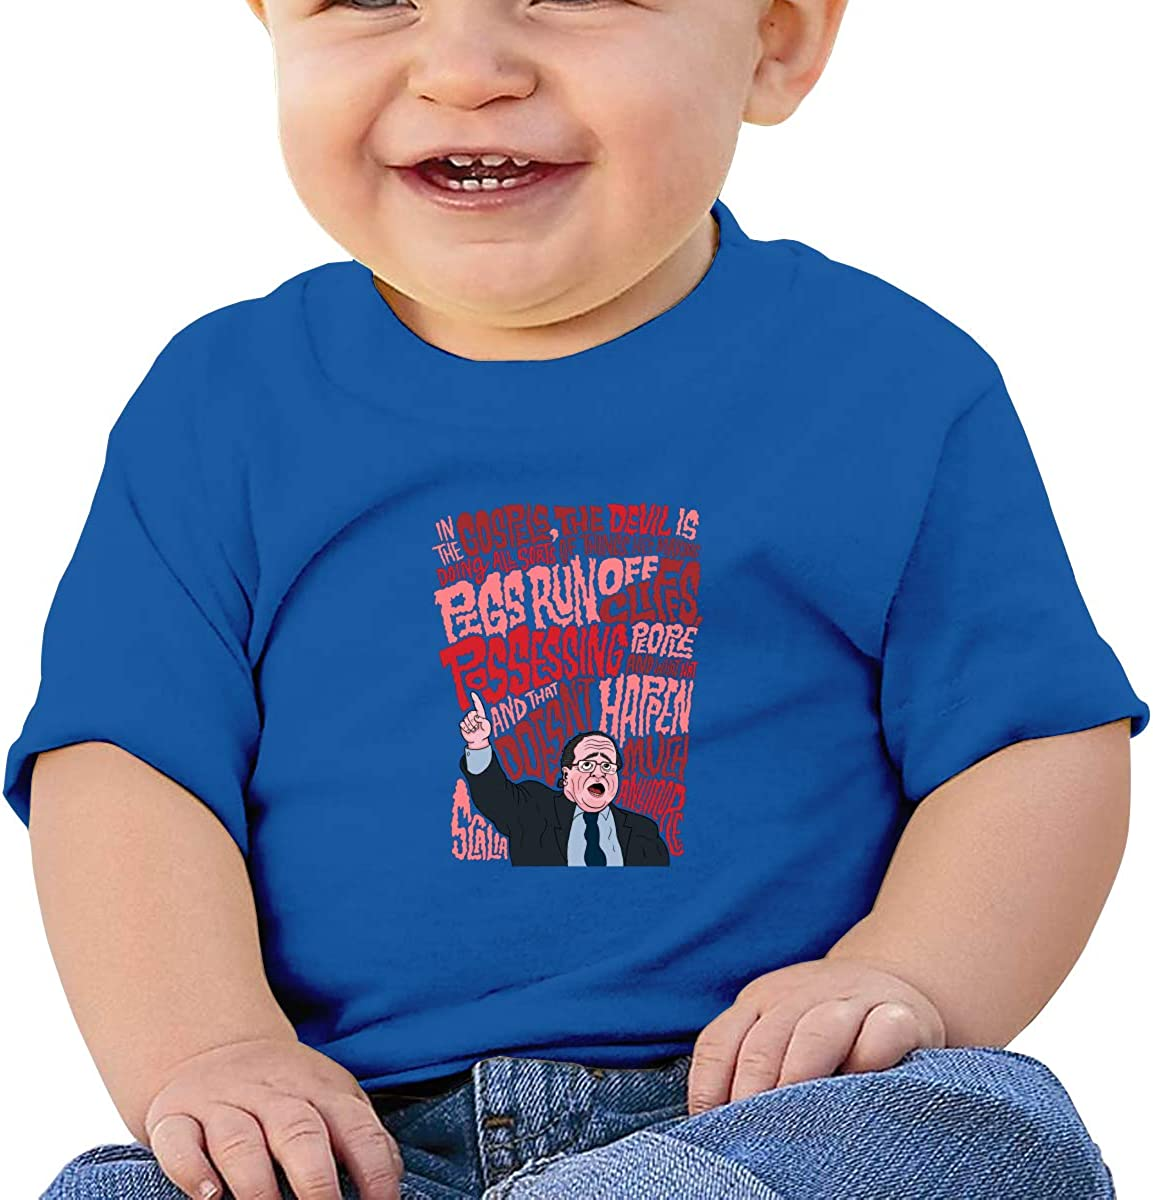 EVE JOHN Antonin Scalia Tee Comfortable T Shirts for Toddler Black